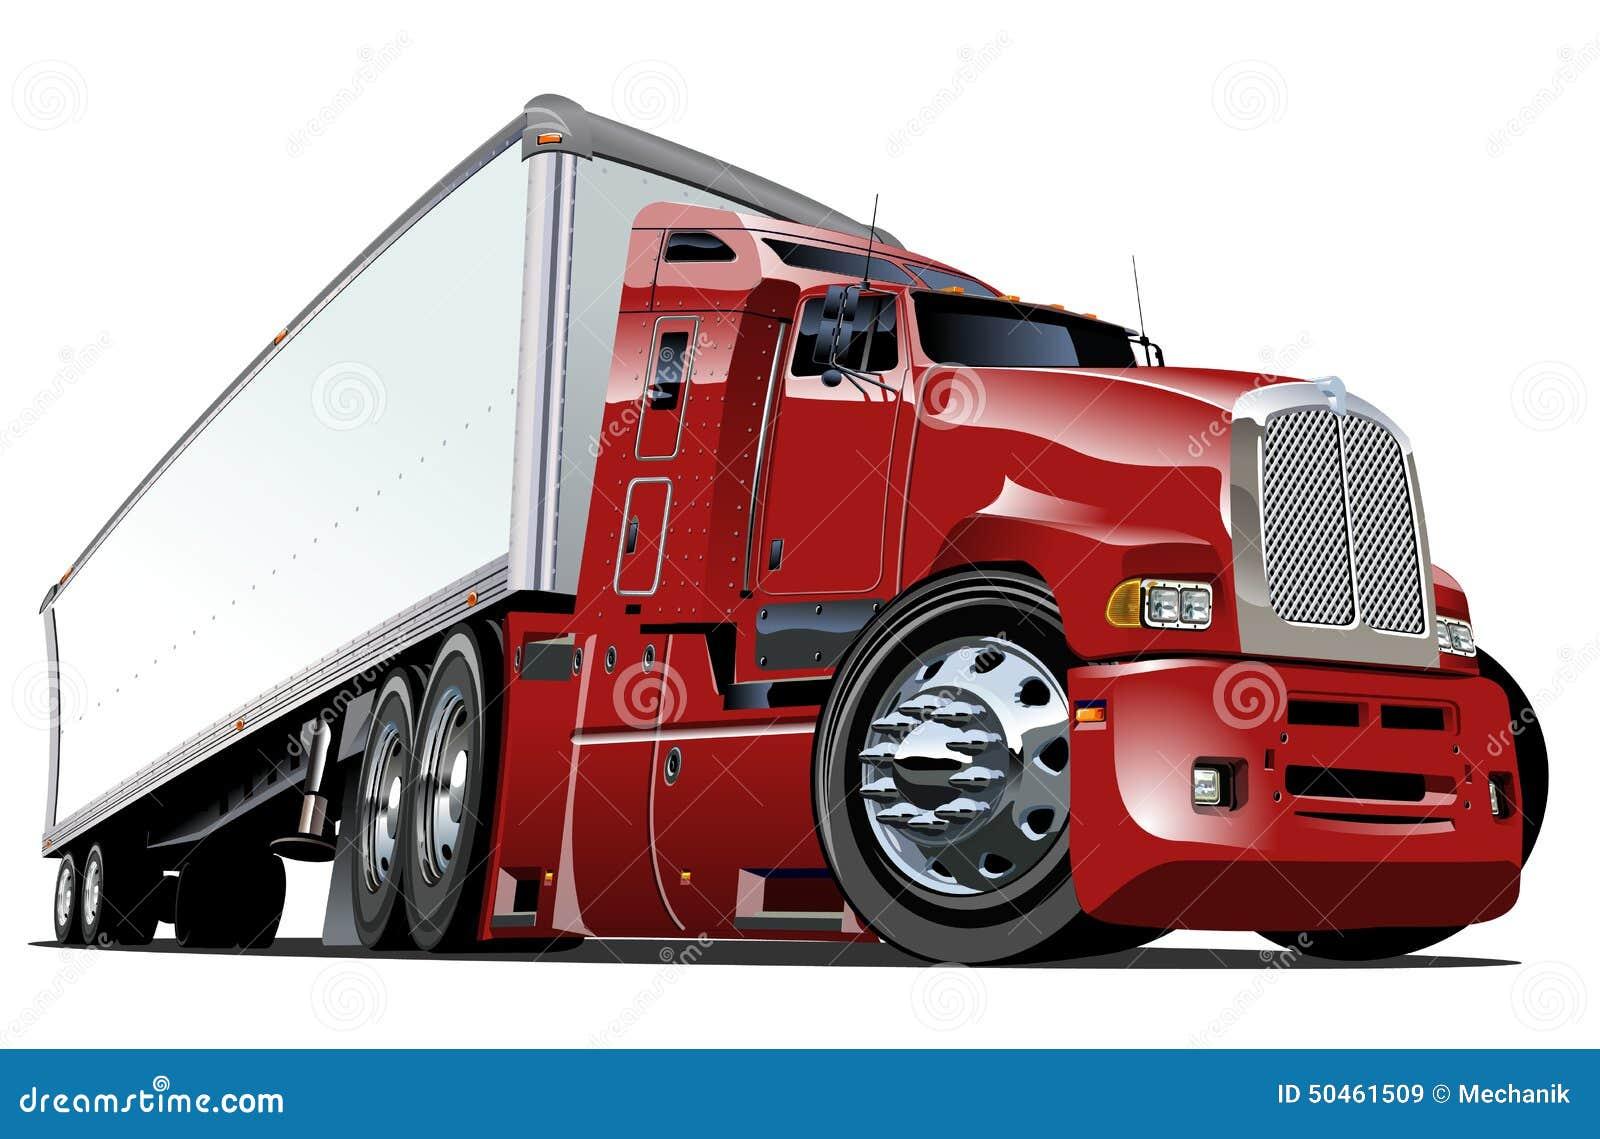 Cartoon semi truck stock vector. Illustration of cargo ...